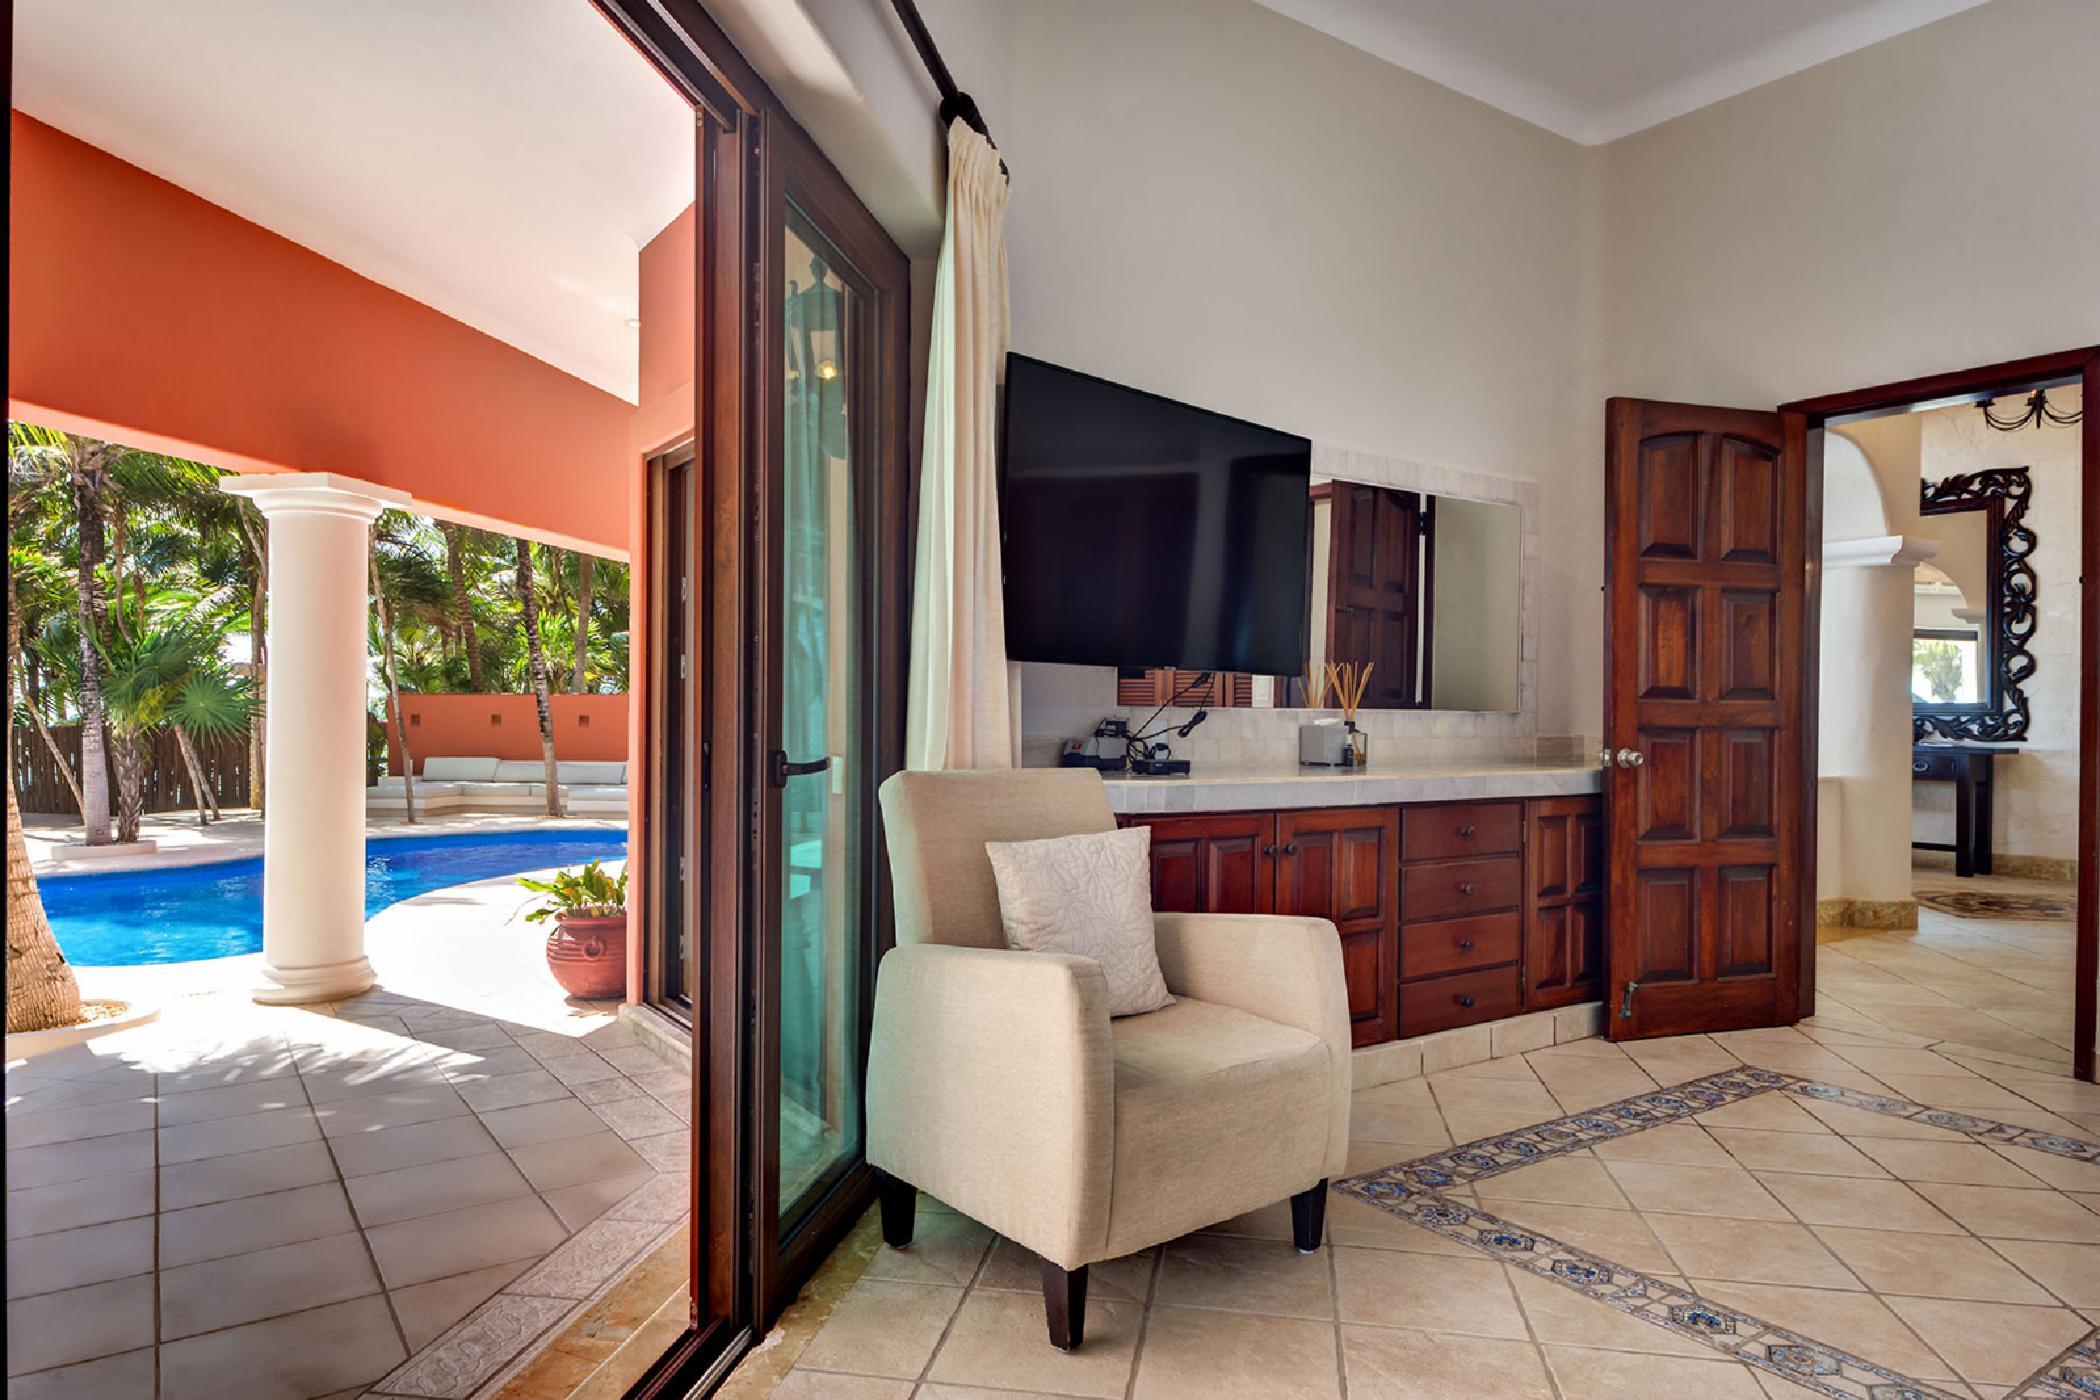 Agents_Maya_Luxe_Riviera_Maya_Luxury_Villas_Casa_Yardena22.jpg